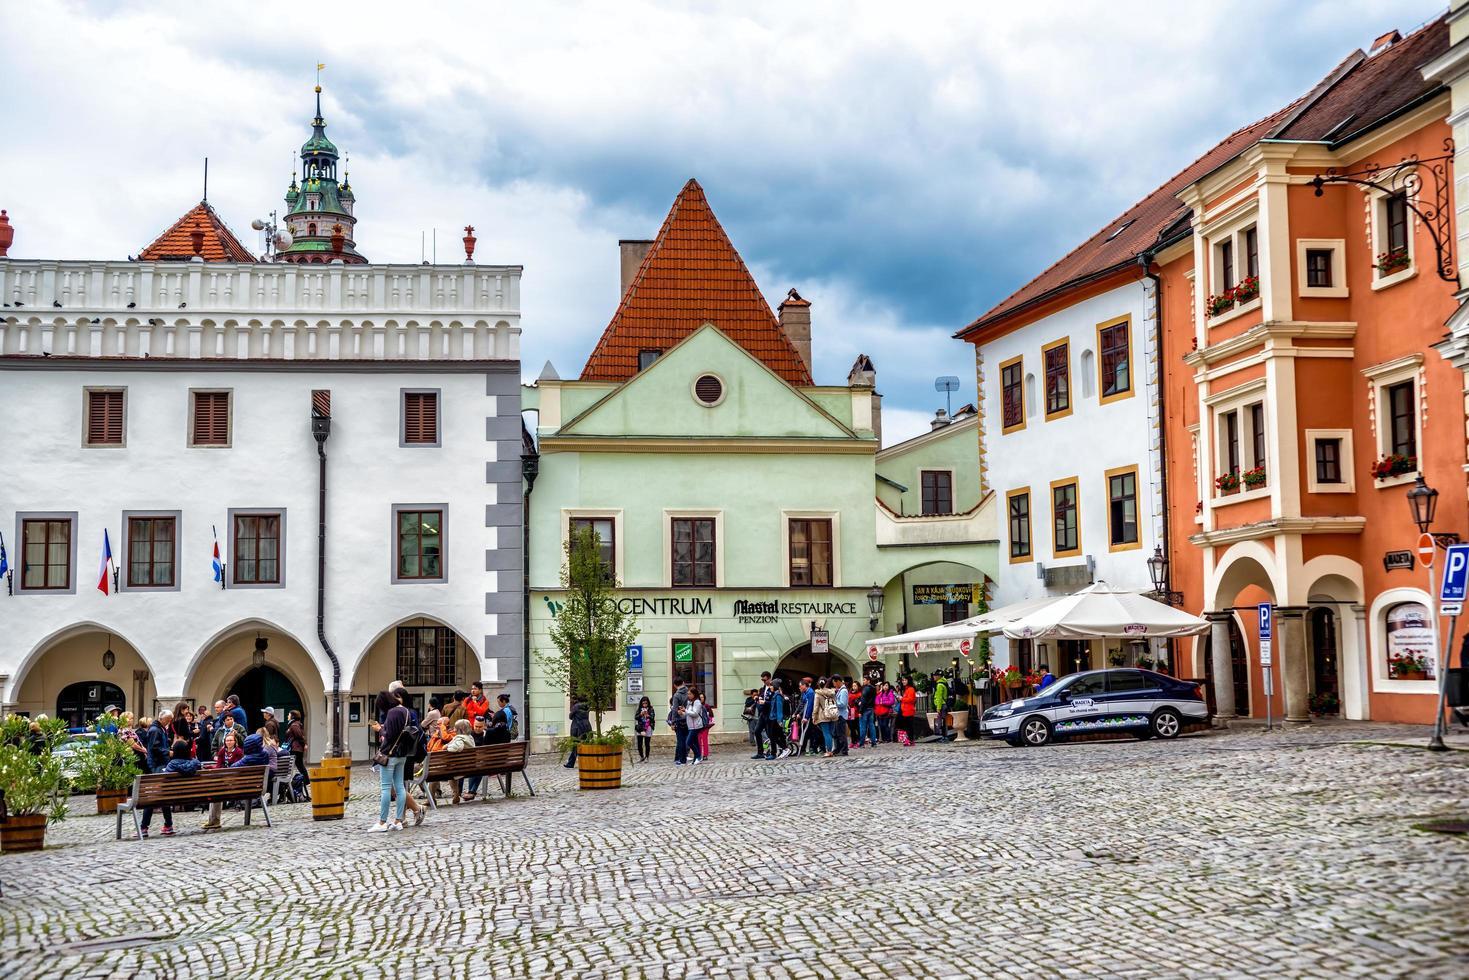 República Checa 2016-- gente en la plaza namesti svornosti, casco histórico de cesky krumlov foto